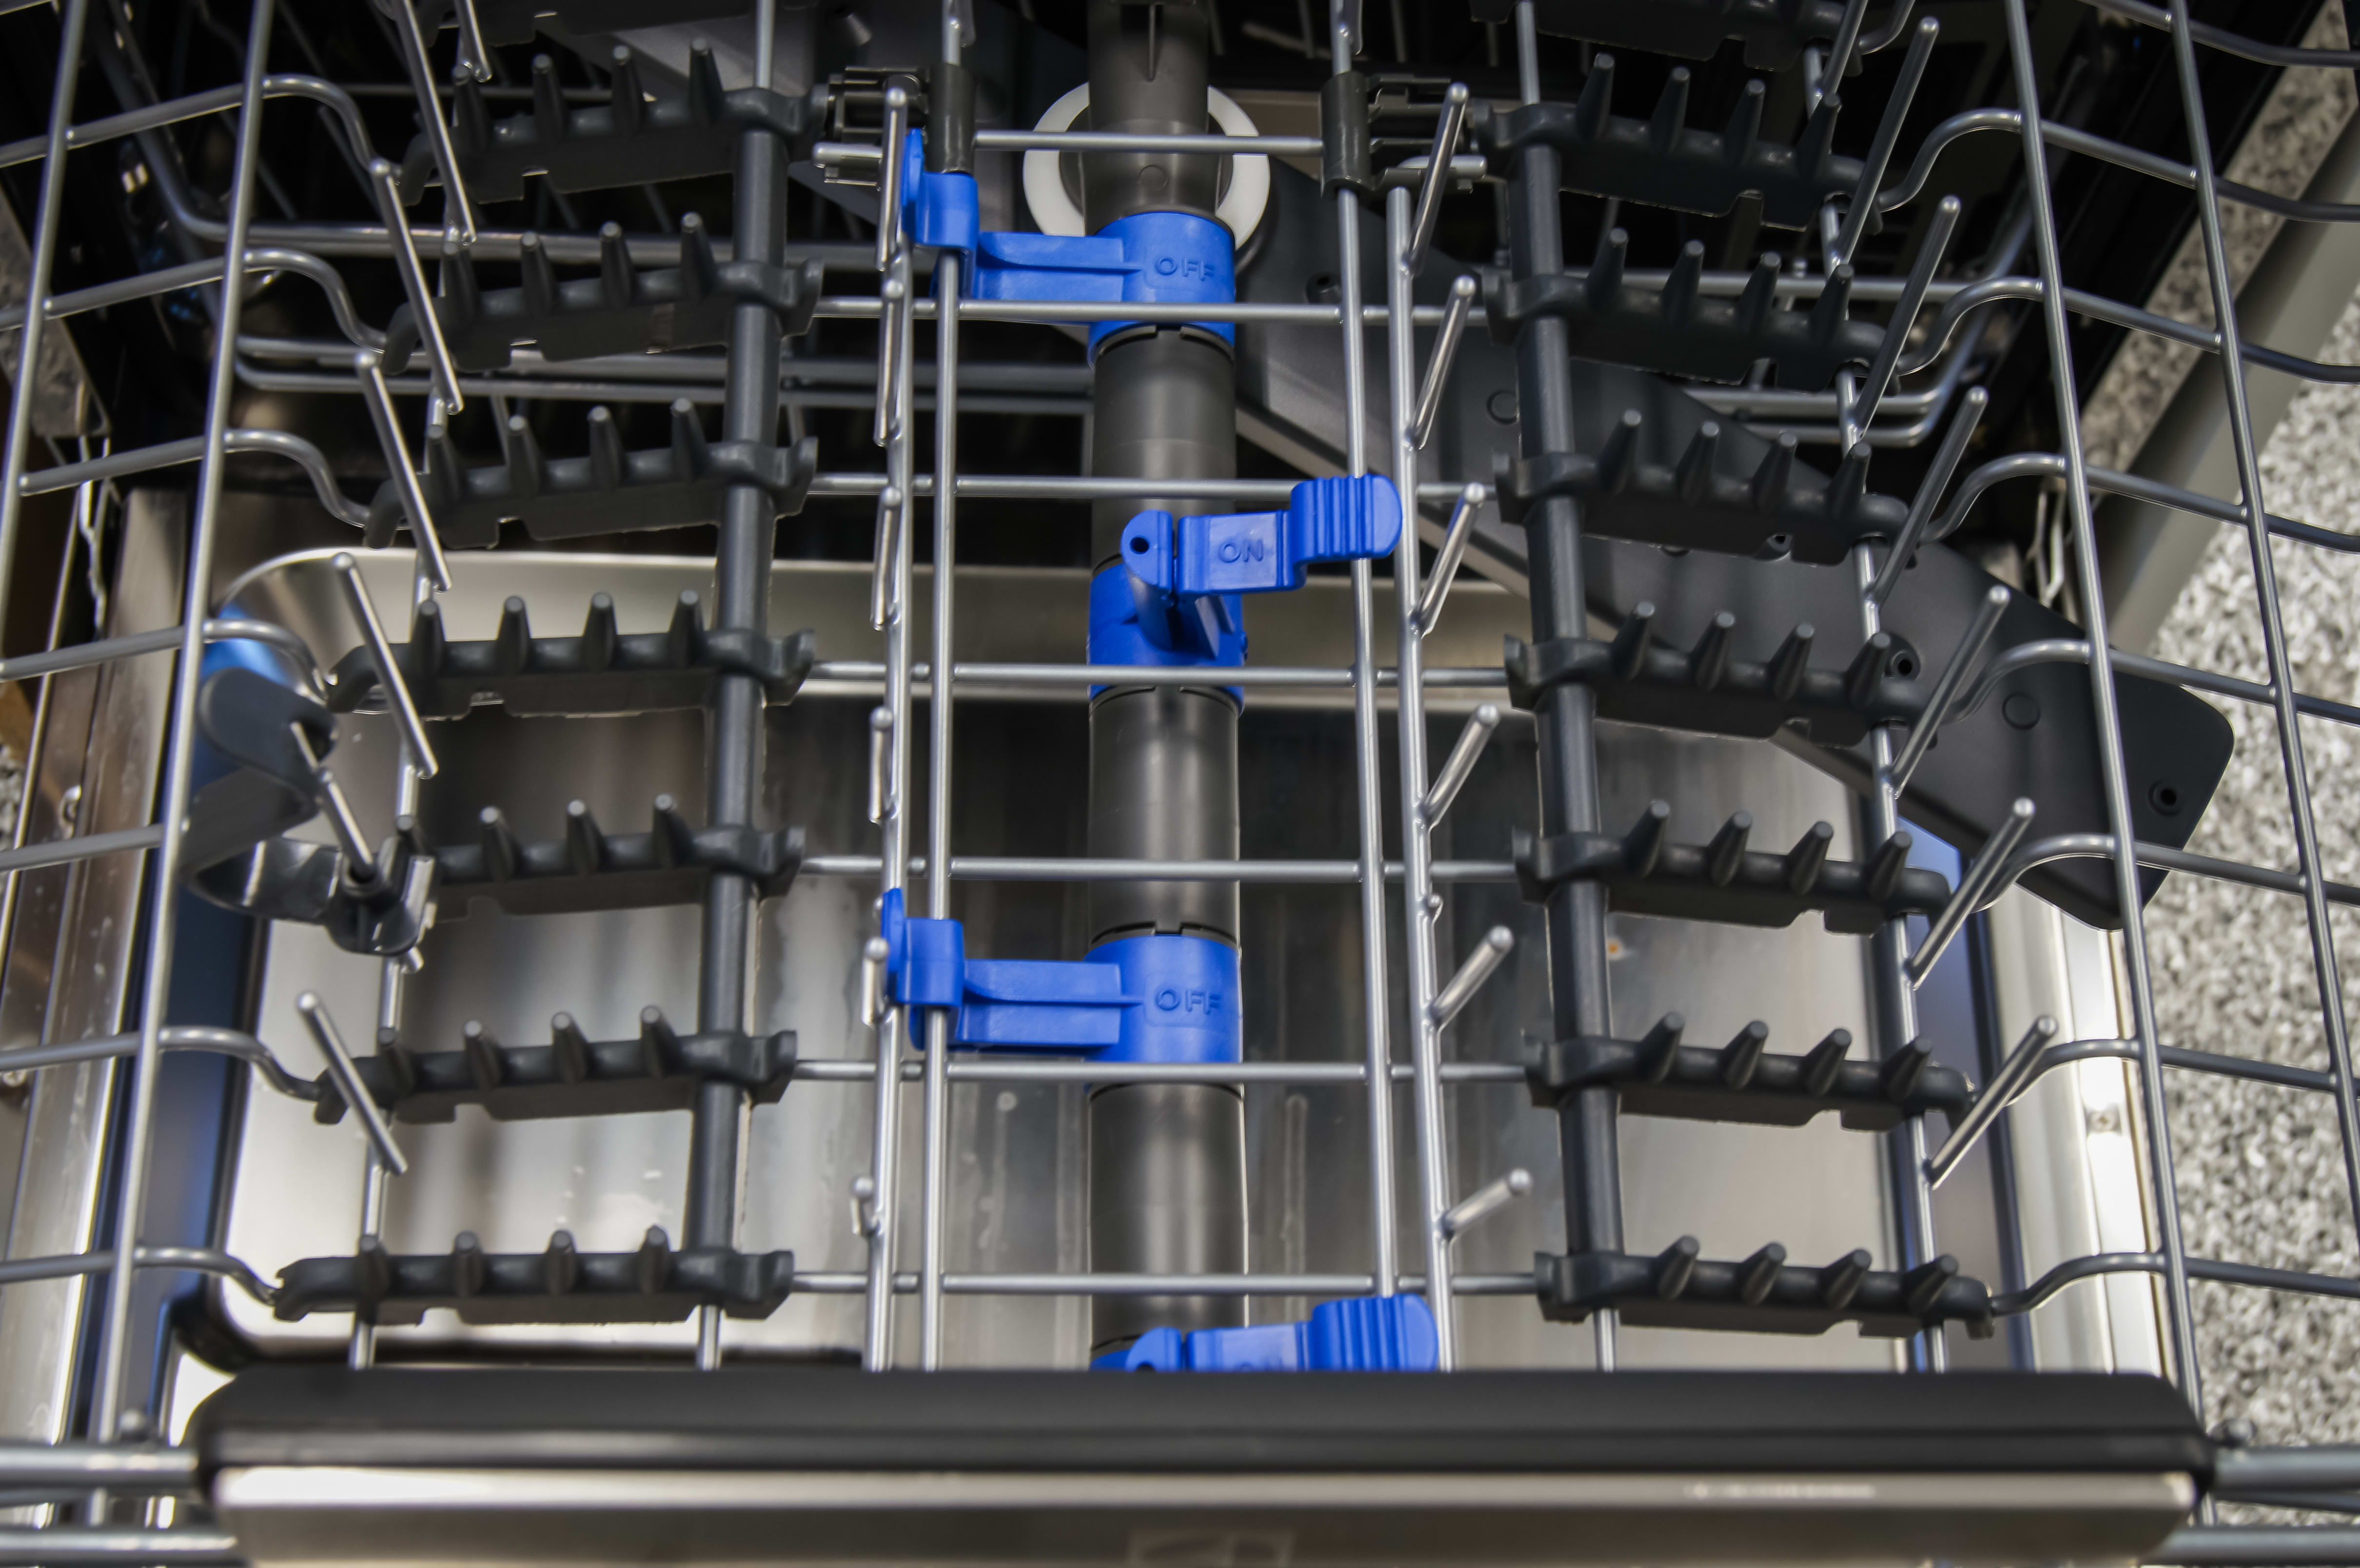 Electrolux EI24ID50QS Bottle Washer Jets